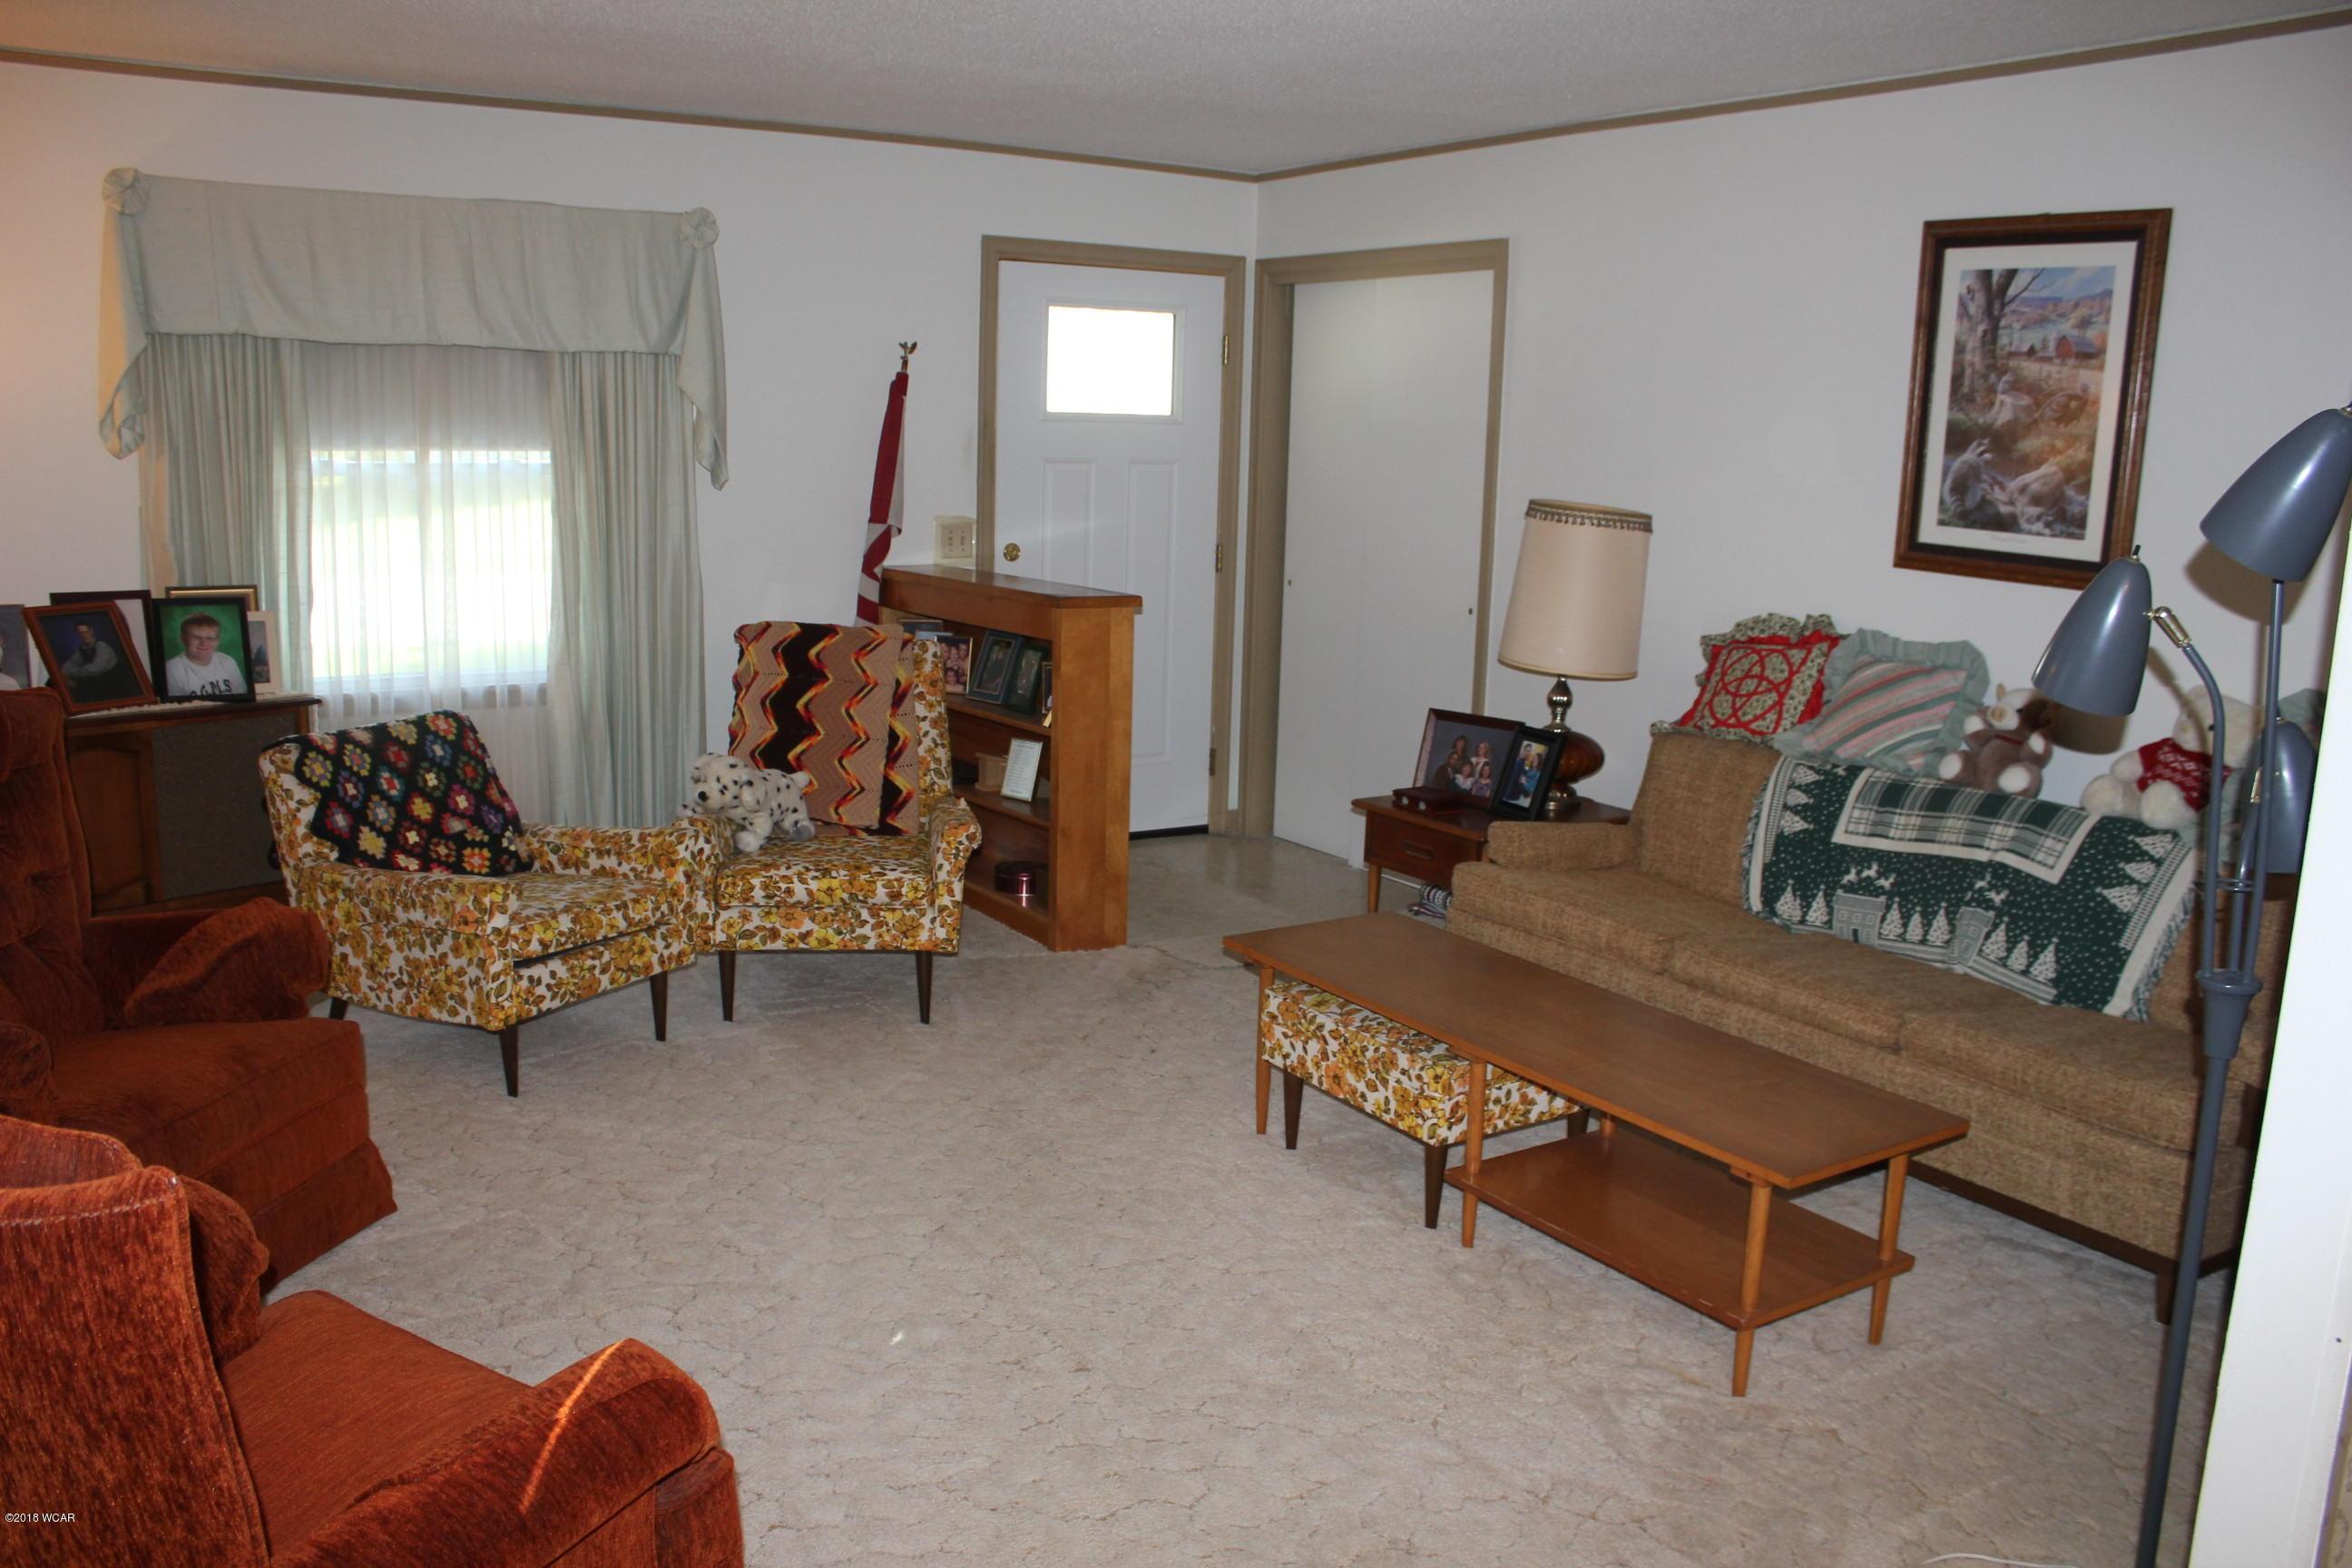 723 11th Street,Benson,2 Bedrooms Bedrooms,1 BathroomBathrooms,Single Family,11th Street,6032550